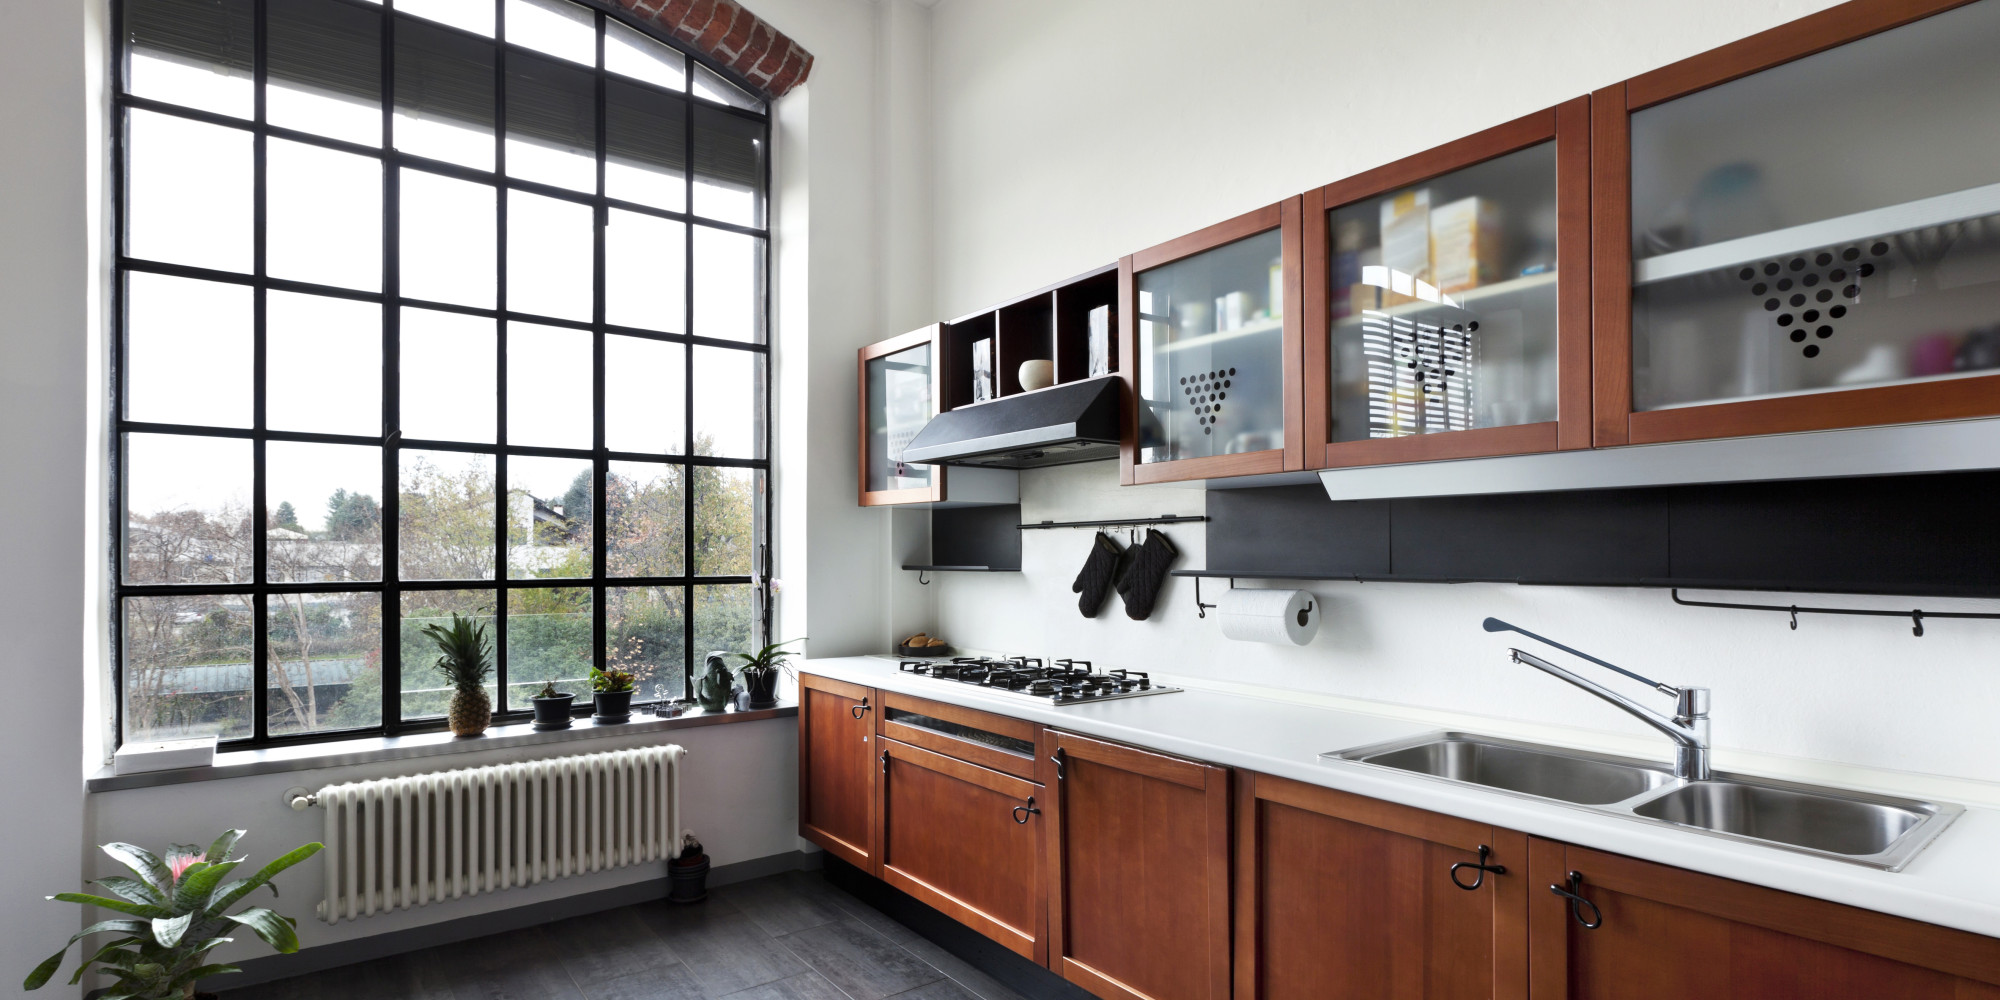 kitchen design trends kitchen design trends grey kitchen trendy kitchen designs trend home design decor